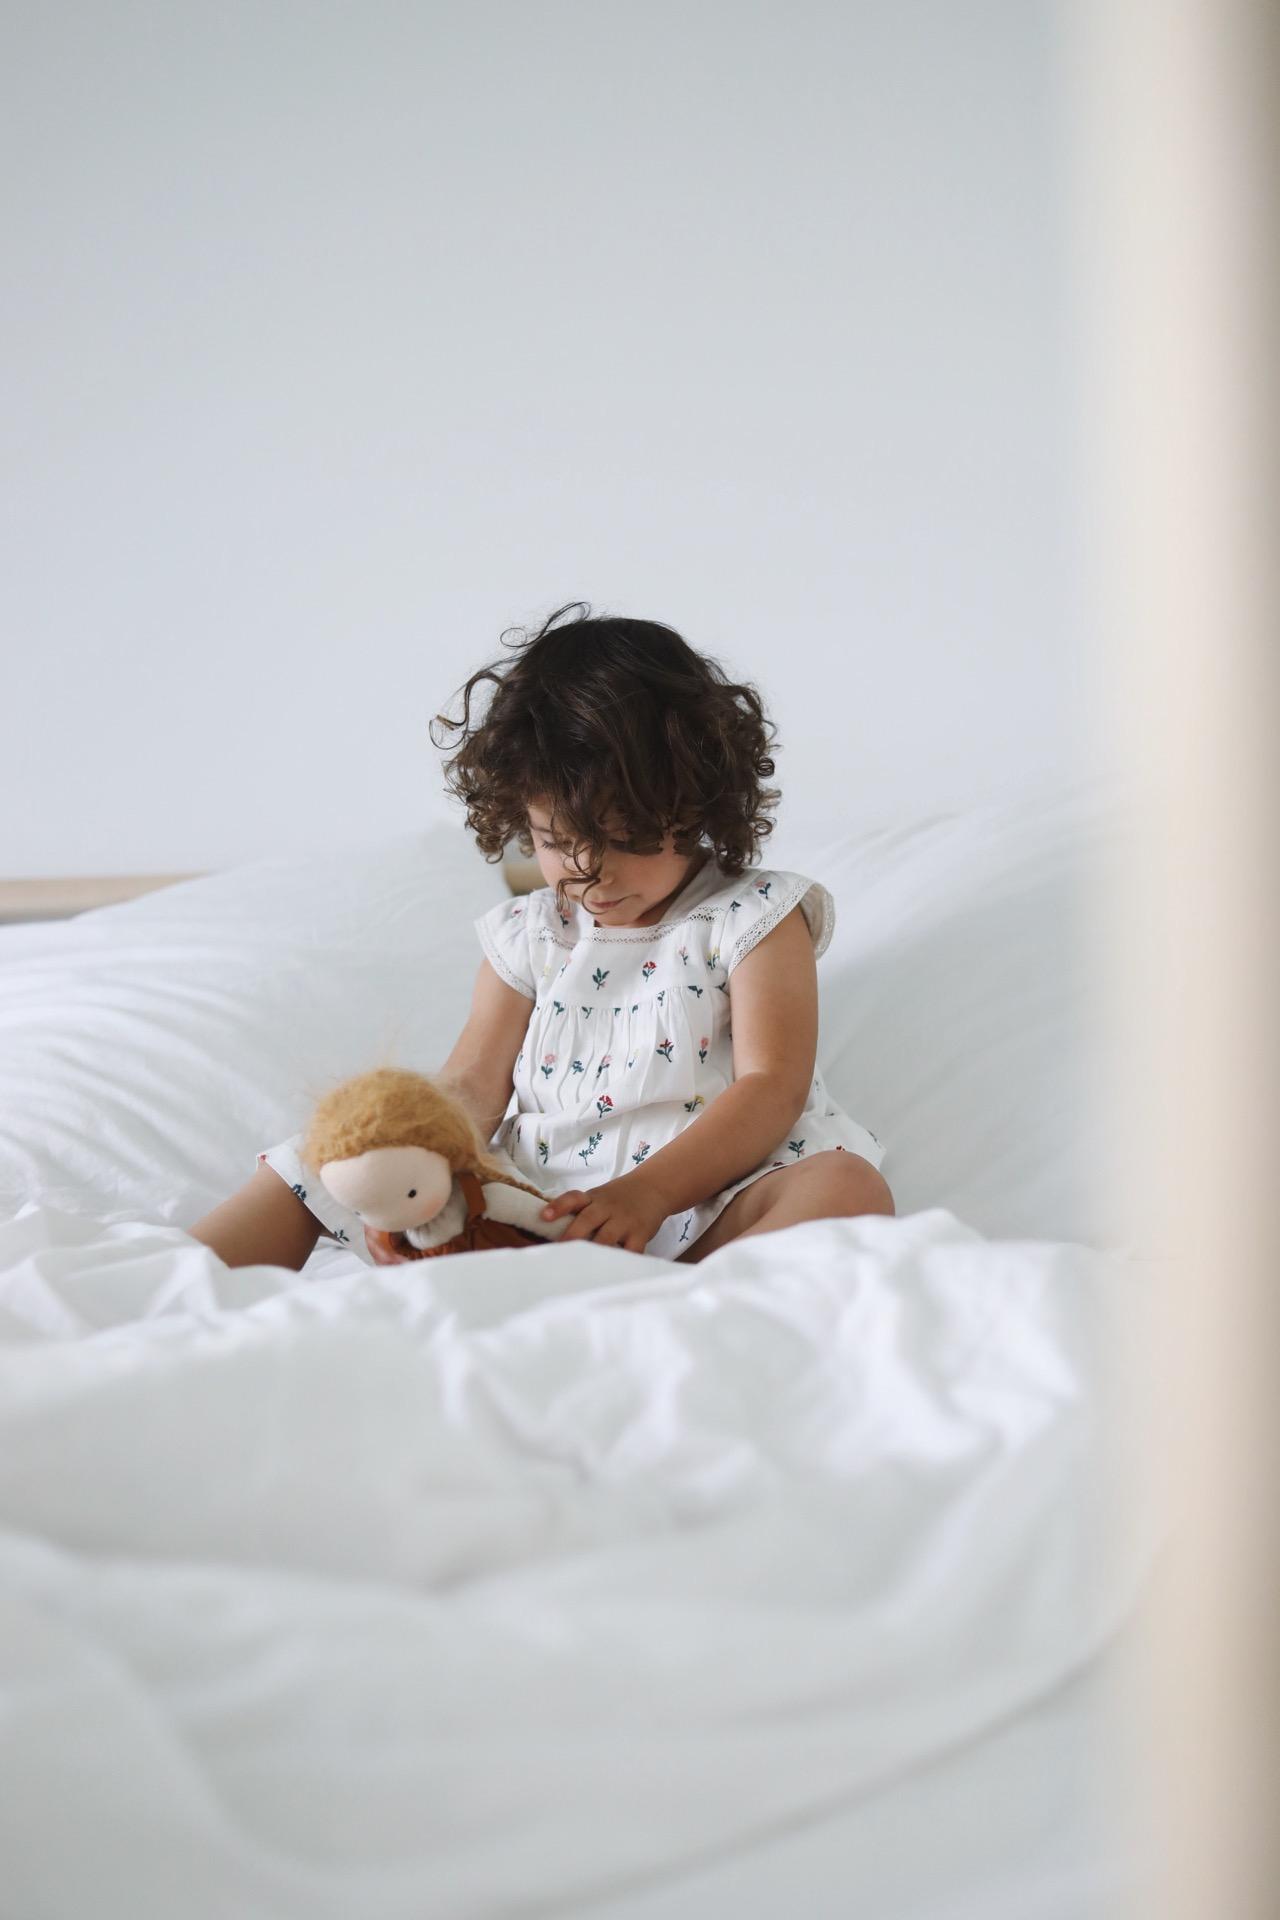 petite fille avec robe blanche